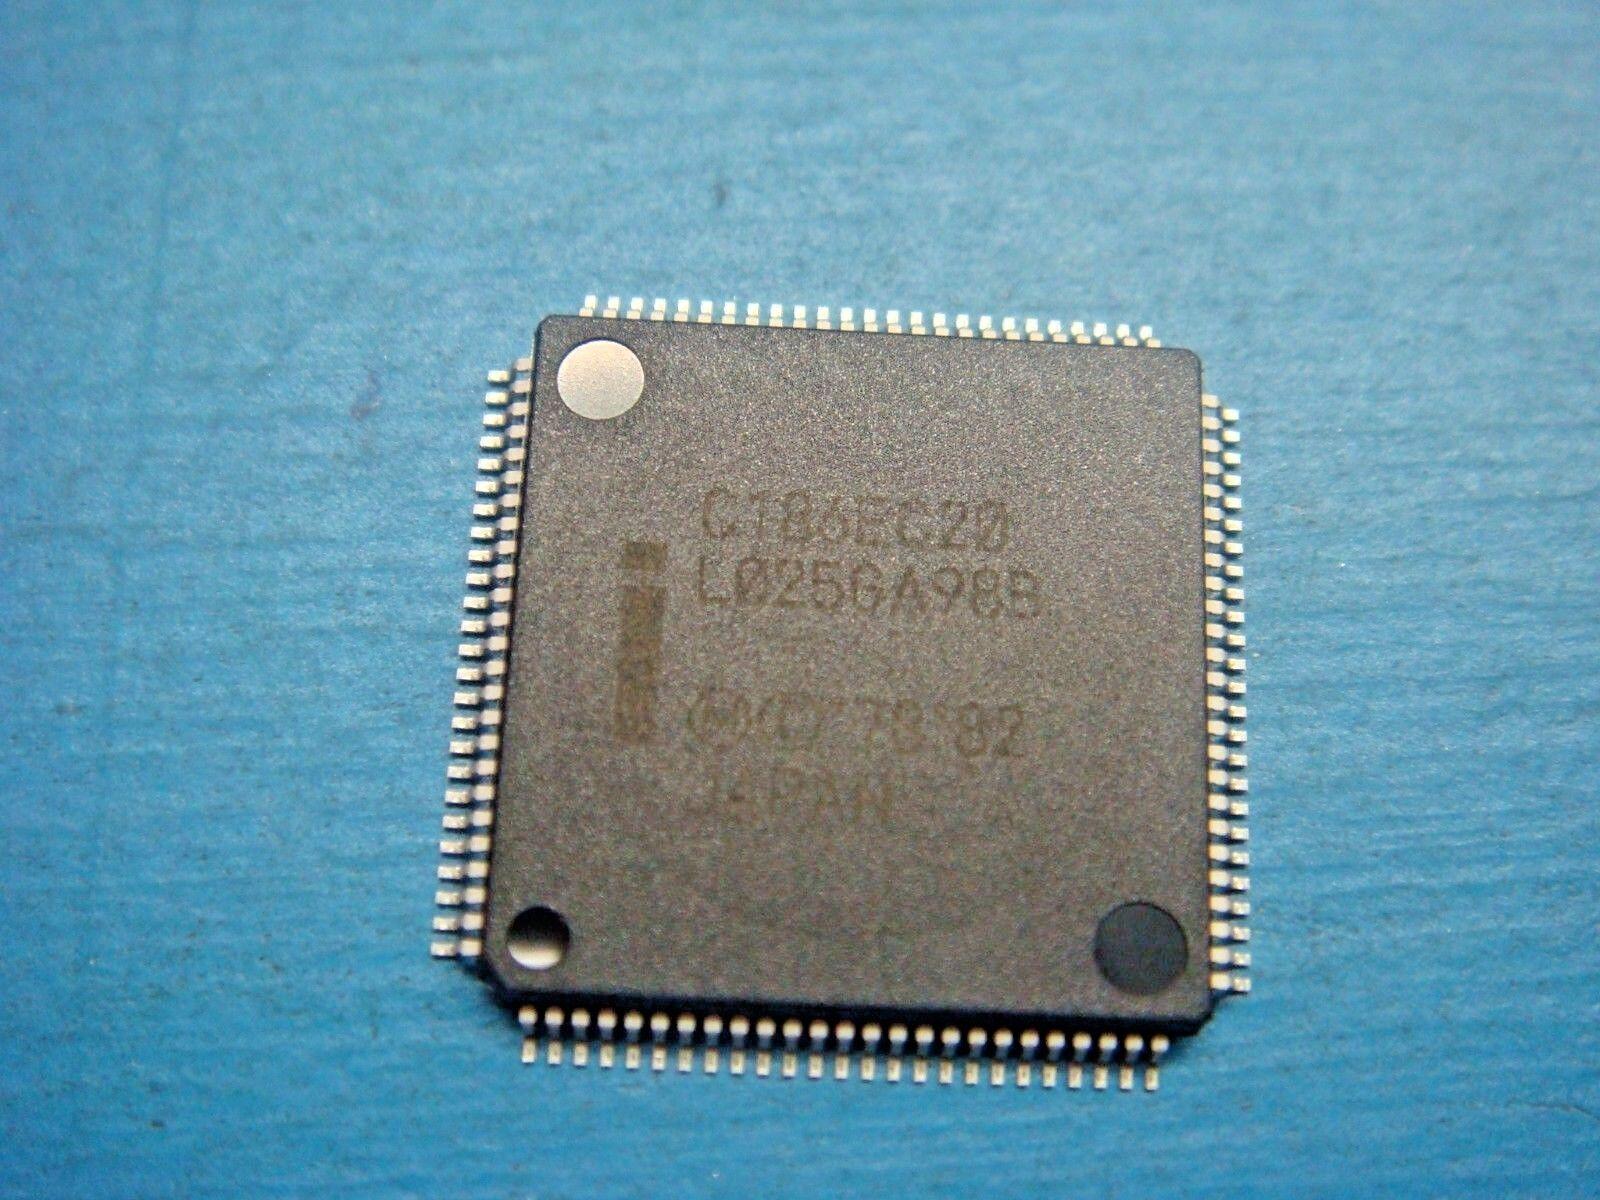 8-Bit 6MHz 44-QFP Z84C0006FEC ZILOG Z80 Microprocessor IC Z80 1 Core